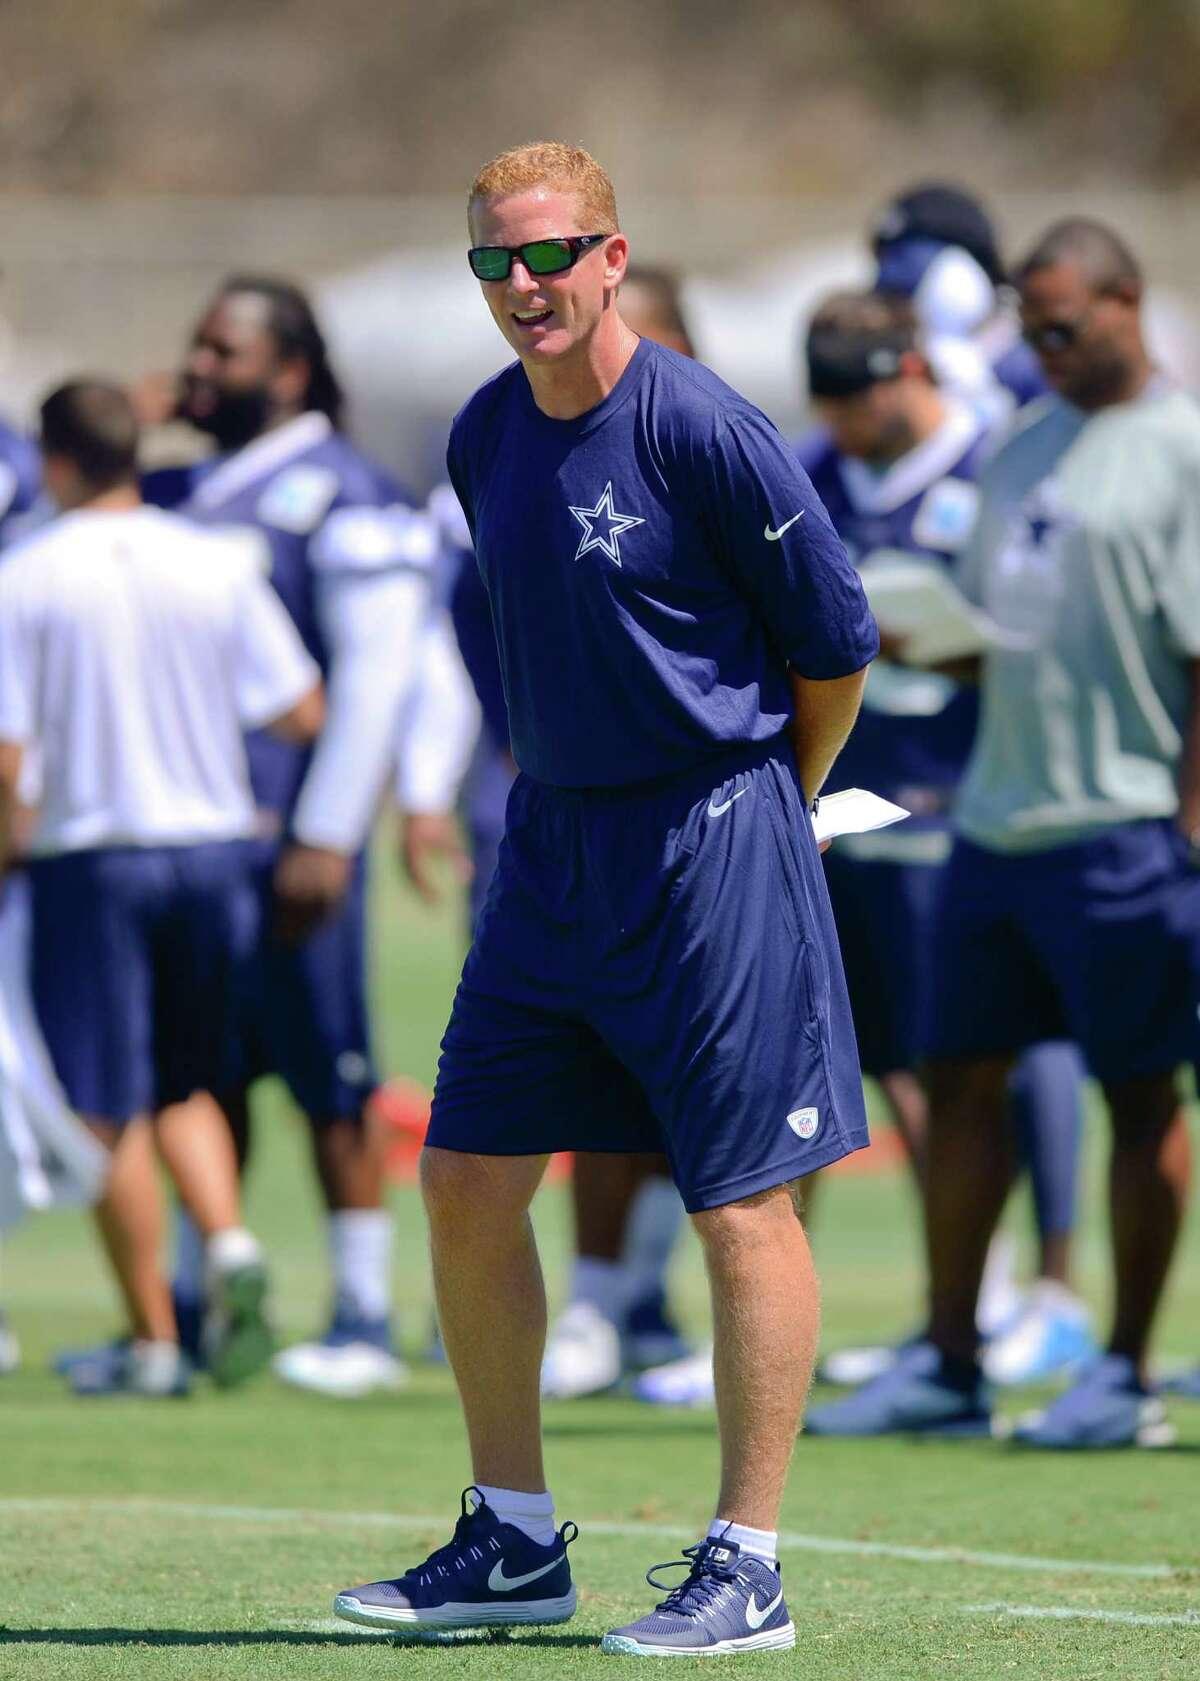 Dallas Cowboys head coach Jason Garrett yells out instructions as they run the offense during NFL football training camp, Thursday, July 24, 2014, in Oxnard, Calif. (AP Photo/Gus Ruelas)